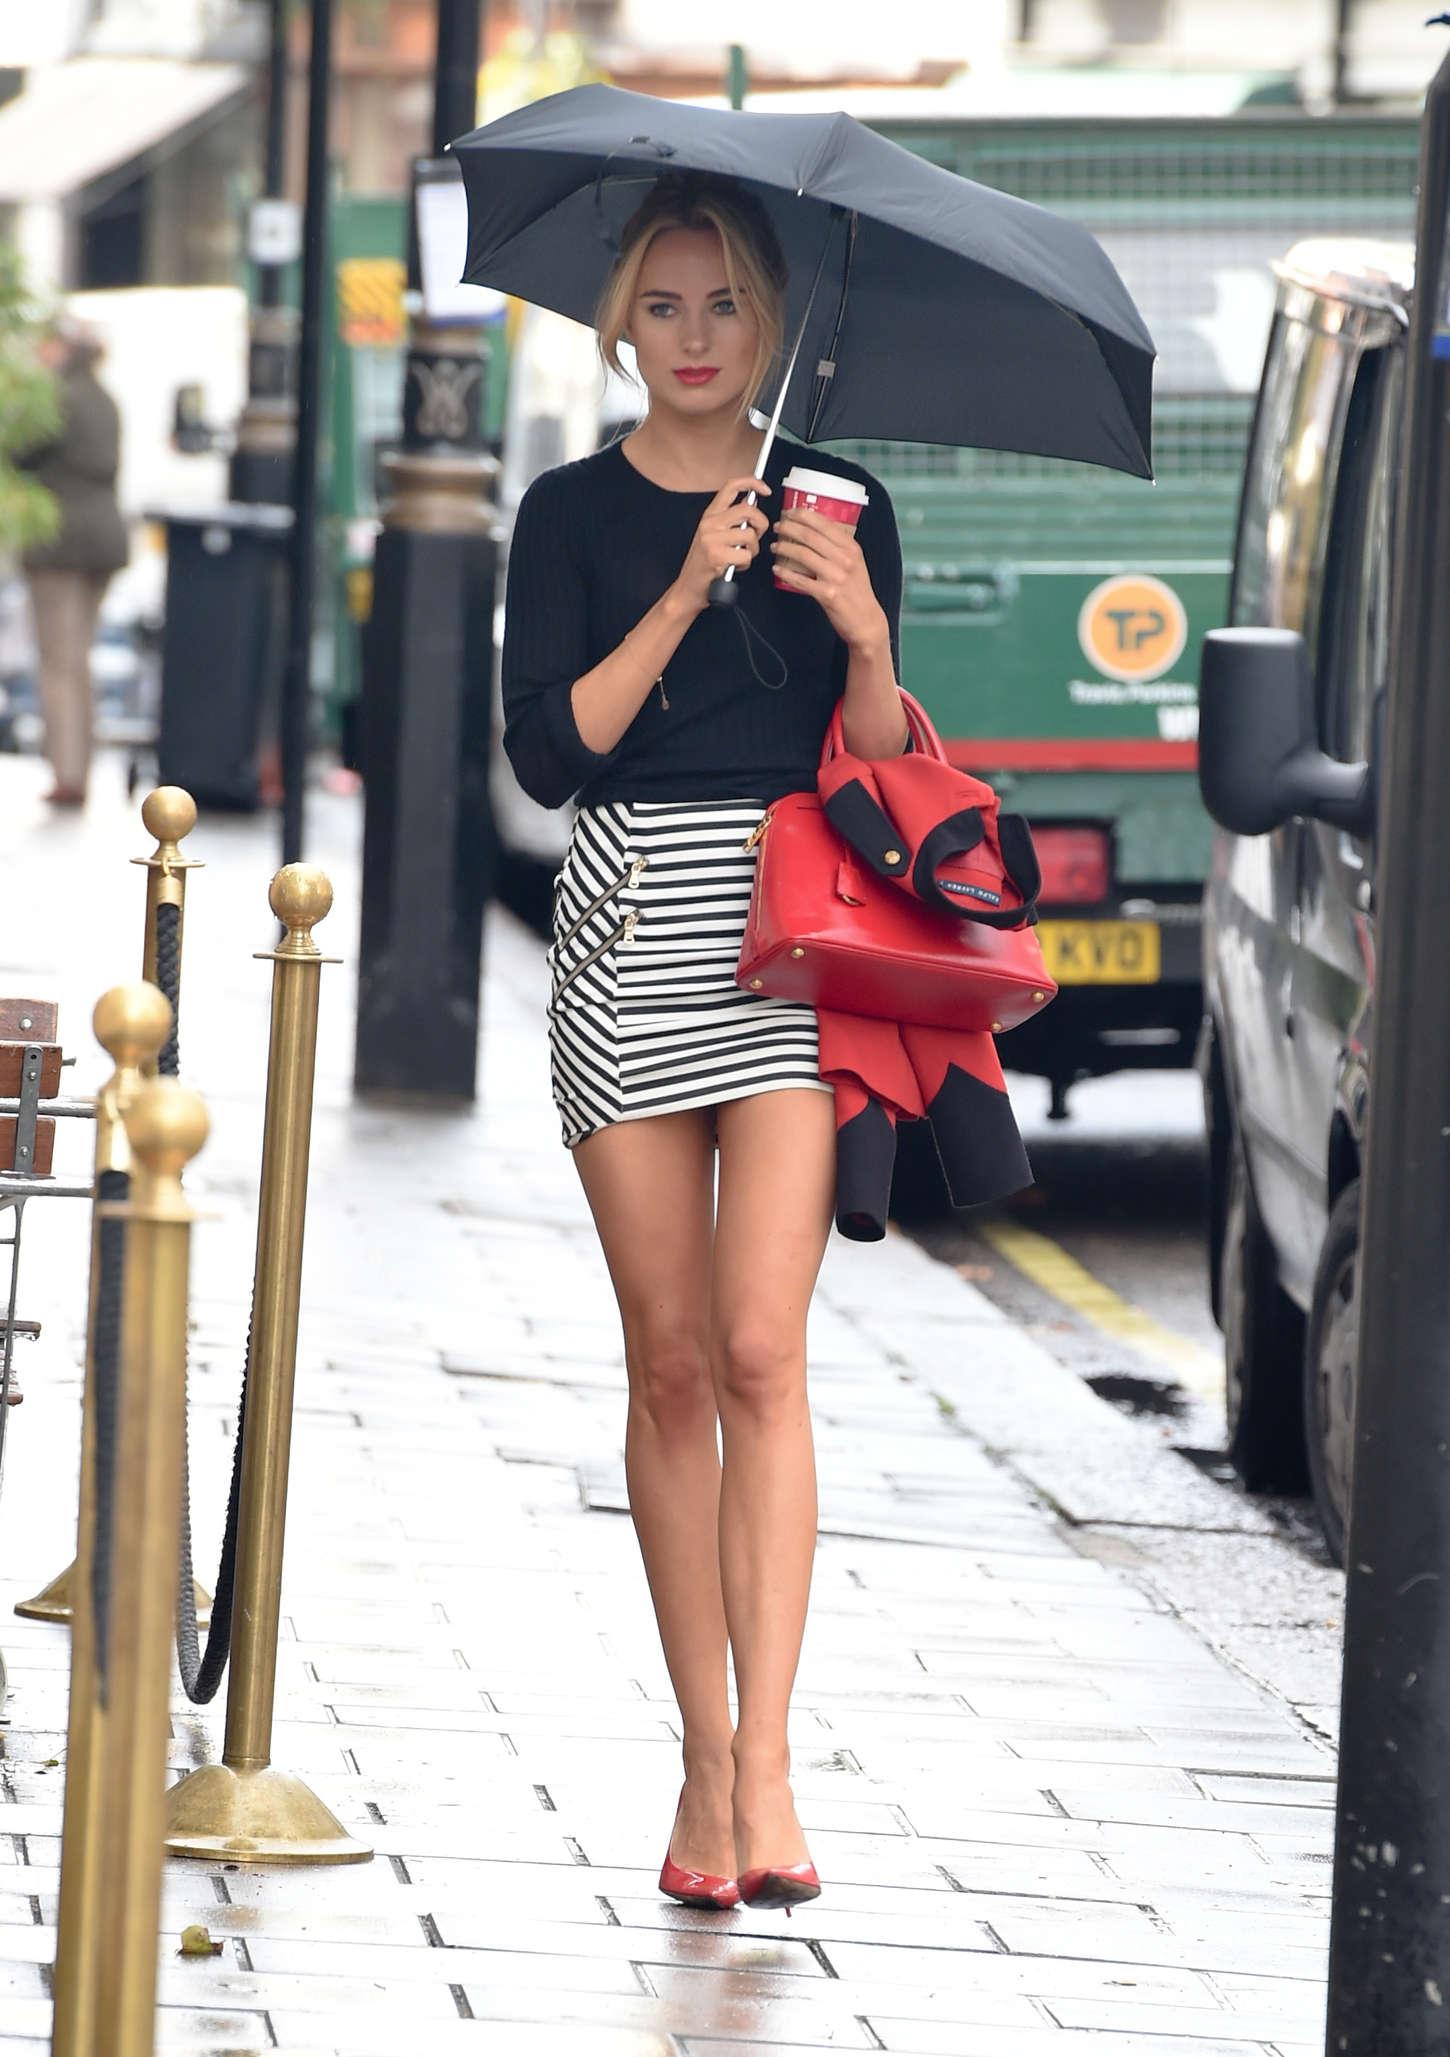 Kimberley Garner In Tight Mini Skirt -33  Gotceleb-3829